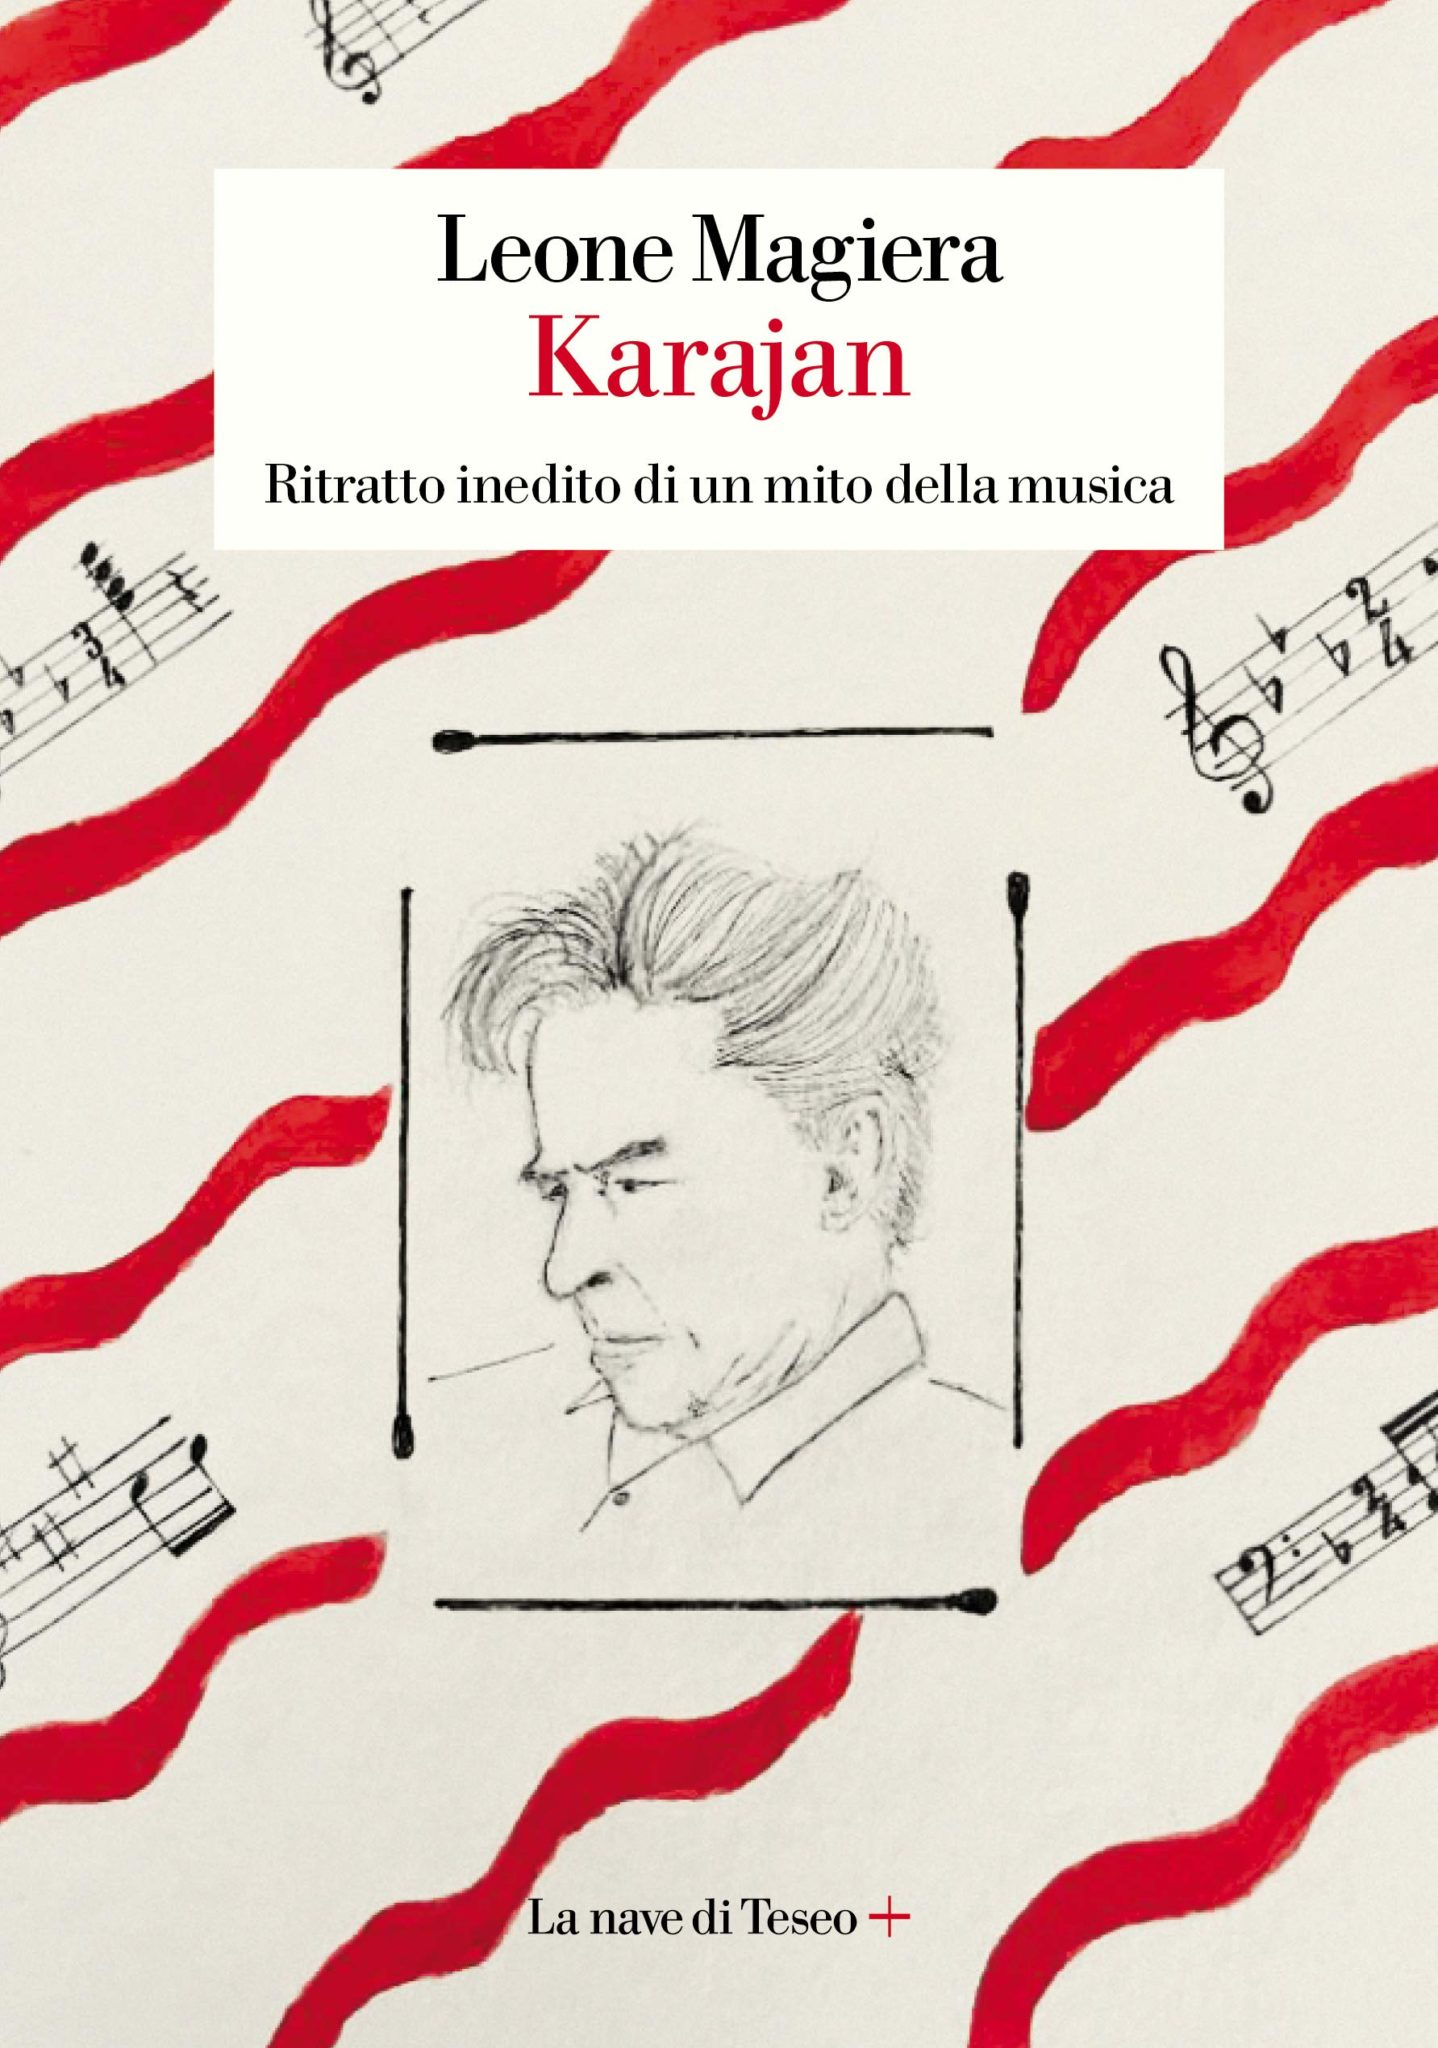 Recensione di Karajan – Leone Magiera